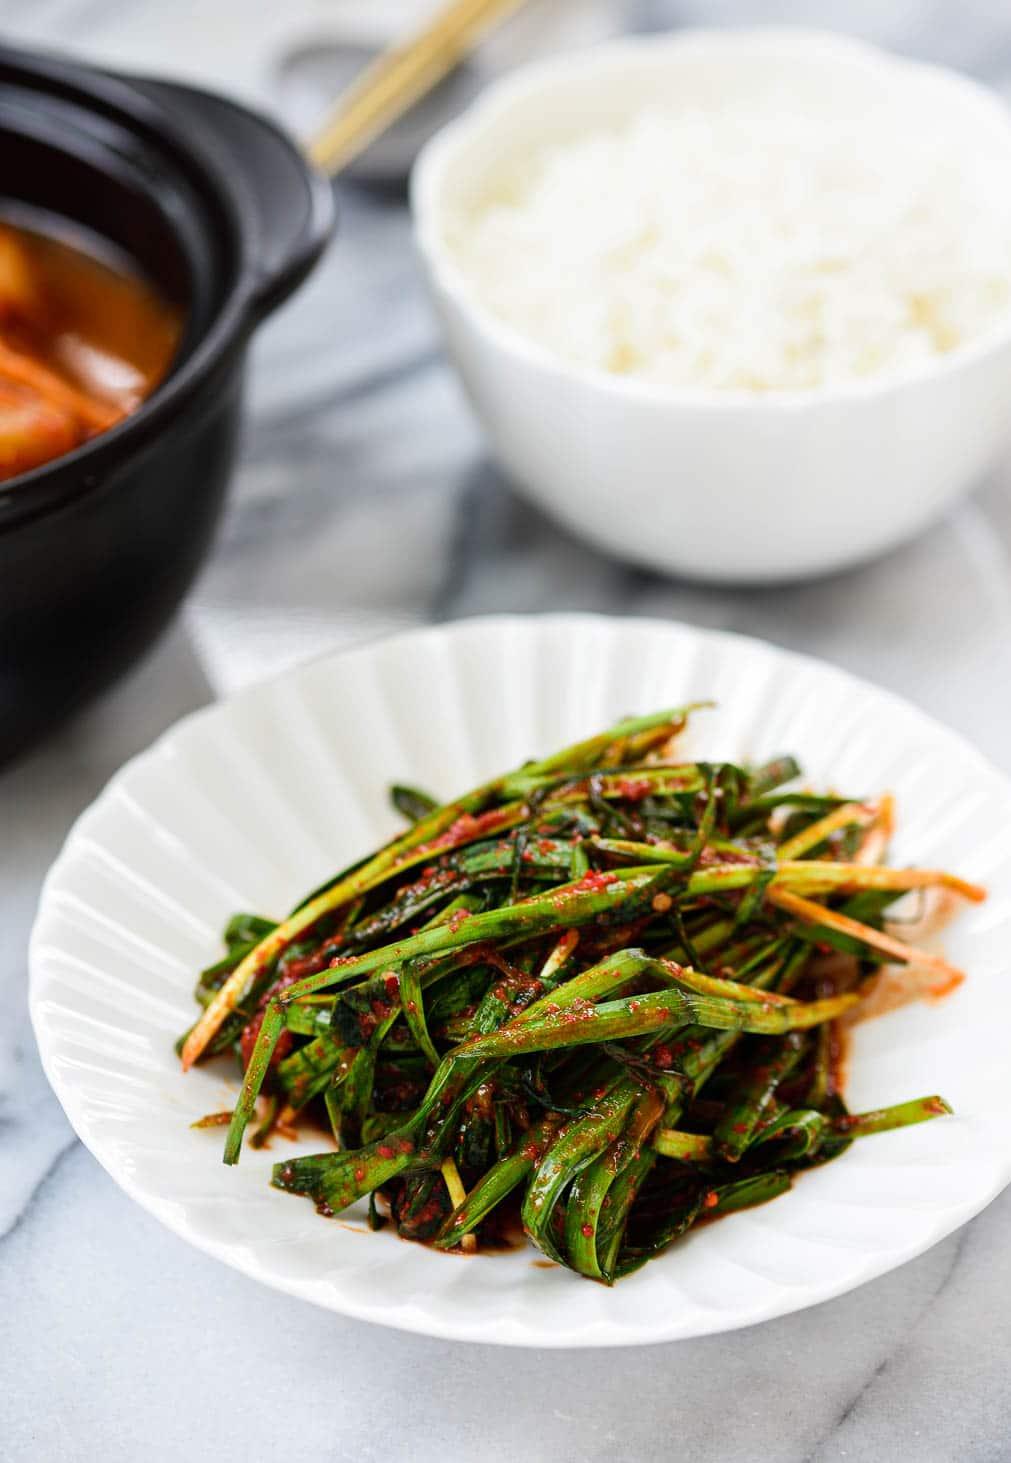 DSC7260 3 - Buchu Kimchi (Garlic Chives Kimchi)